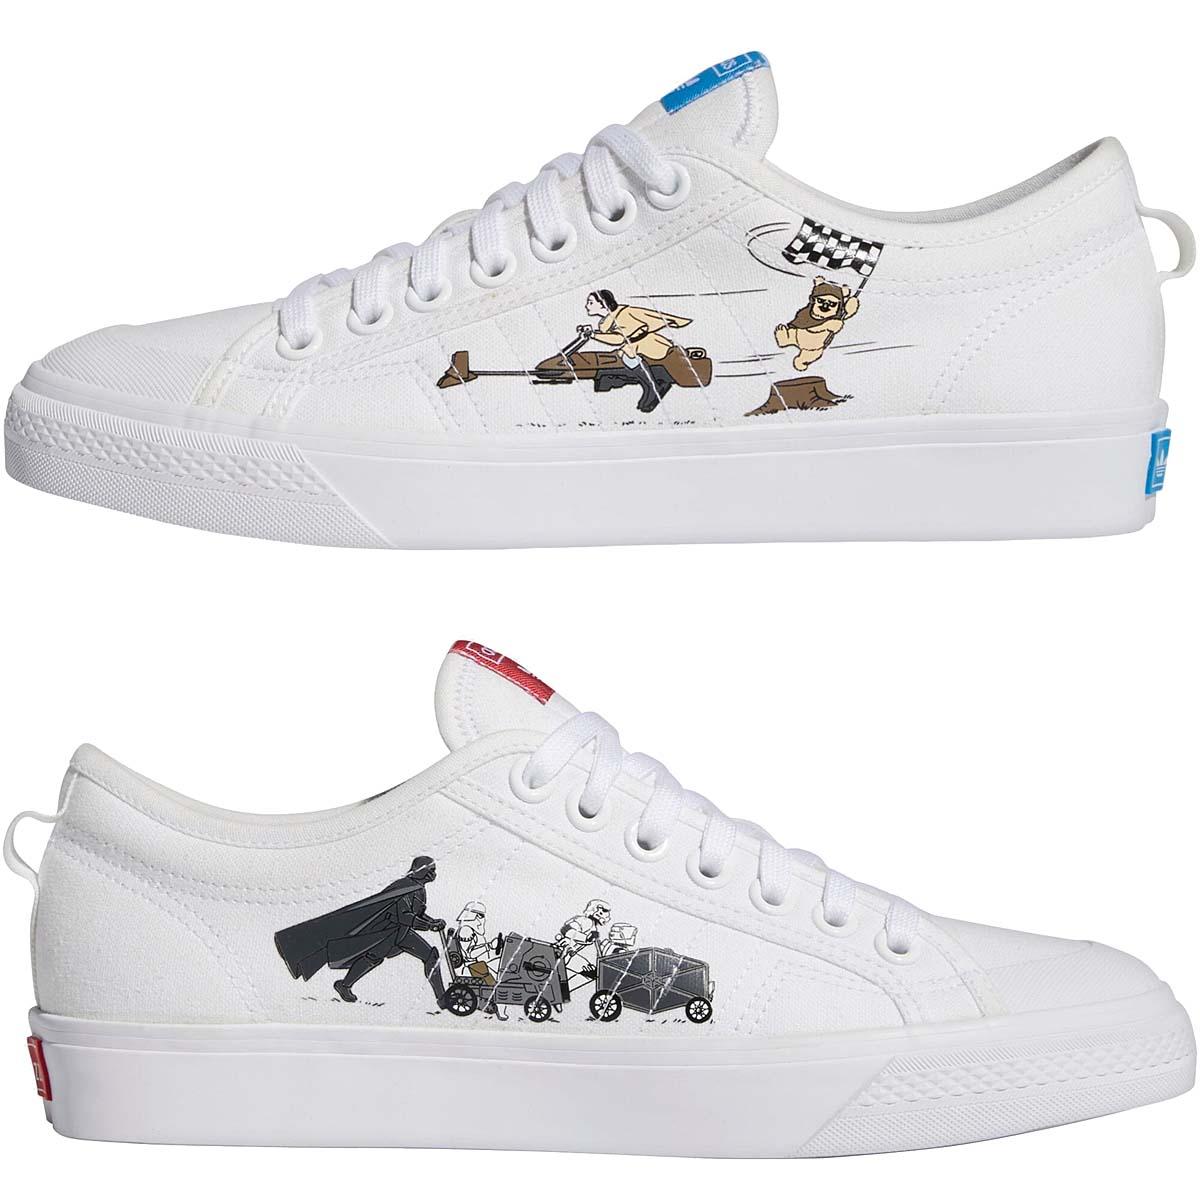 STAR WARS x adidas NIZZA CLOUD WHITE / CLOUD WHITE / BRIGHT BLUE FX8351 スター・ウォーズ × アディダス ニッツァ ホワイト